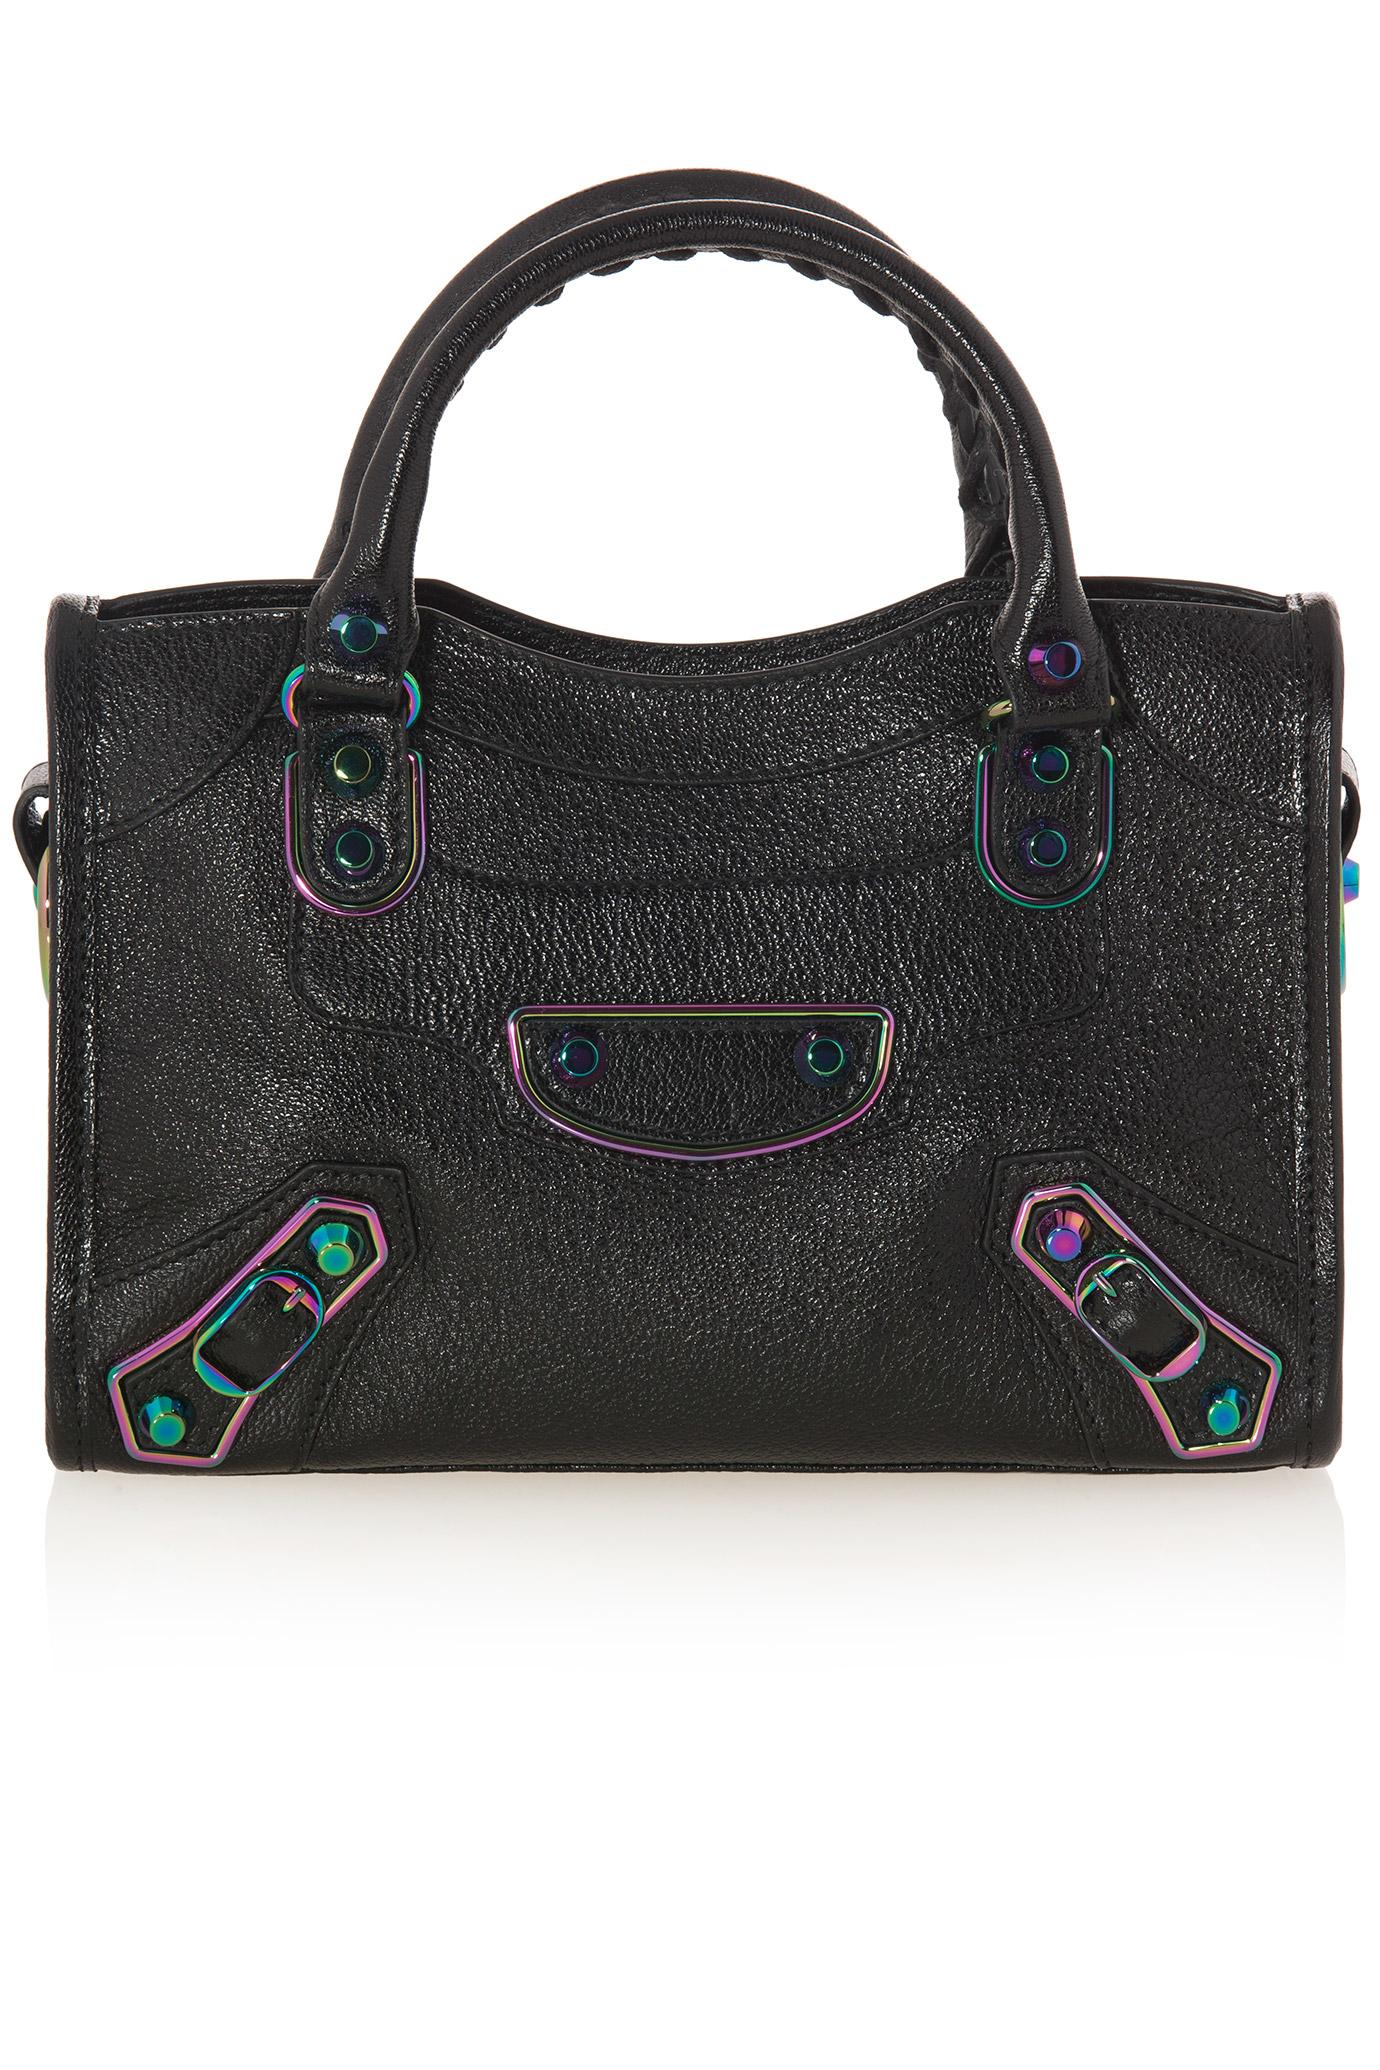 balenciaga classic mini city iridescent tote bag in black lyst. Black Bedroom Furniture Sets. Home Design Ideas